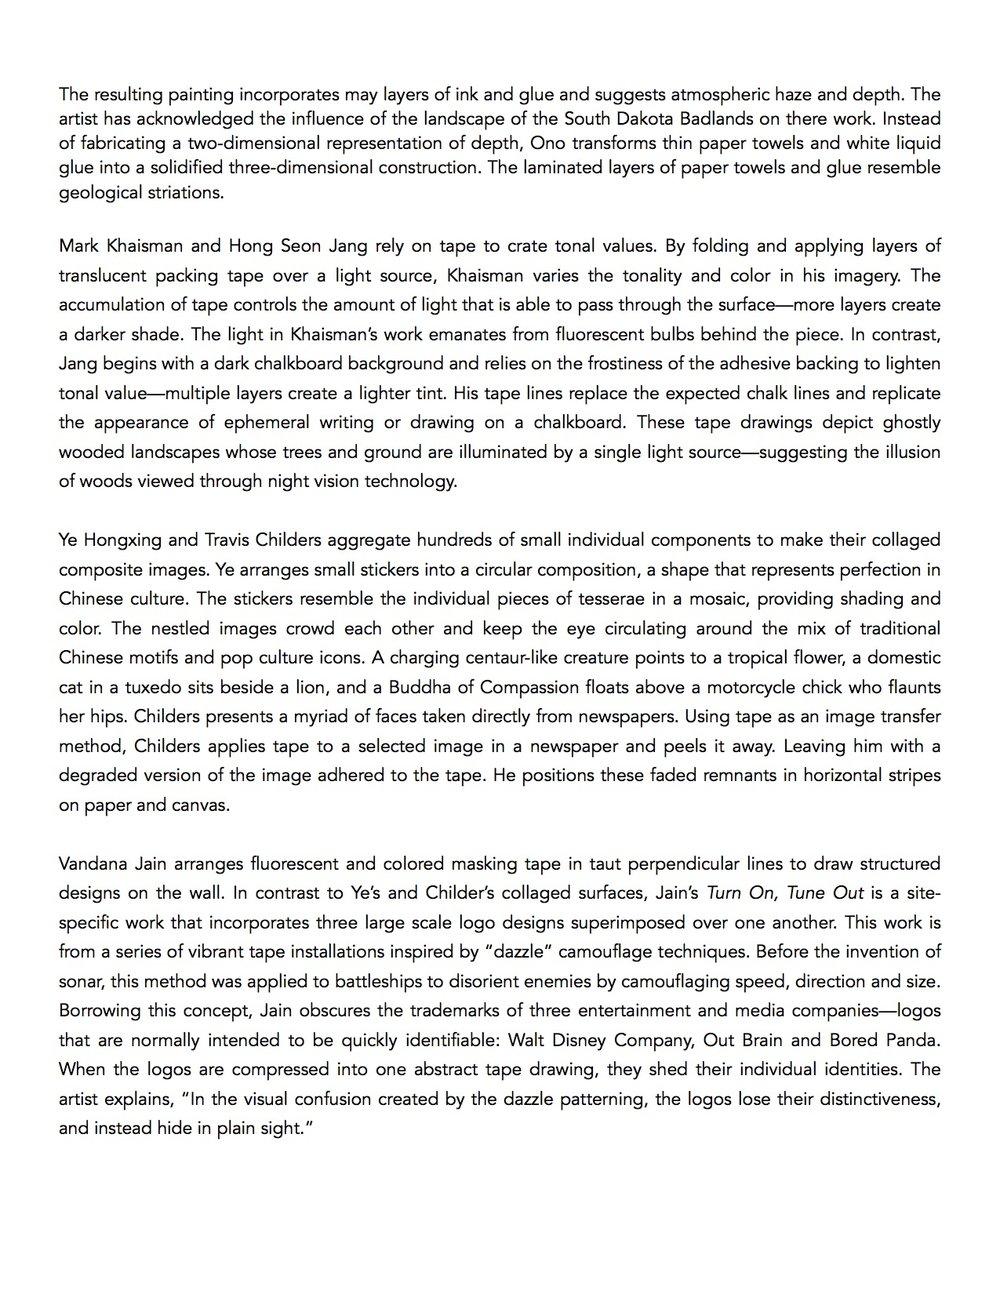 ExposingAdhesives_Essay_Pg2.jpg